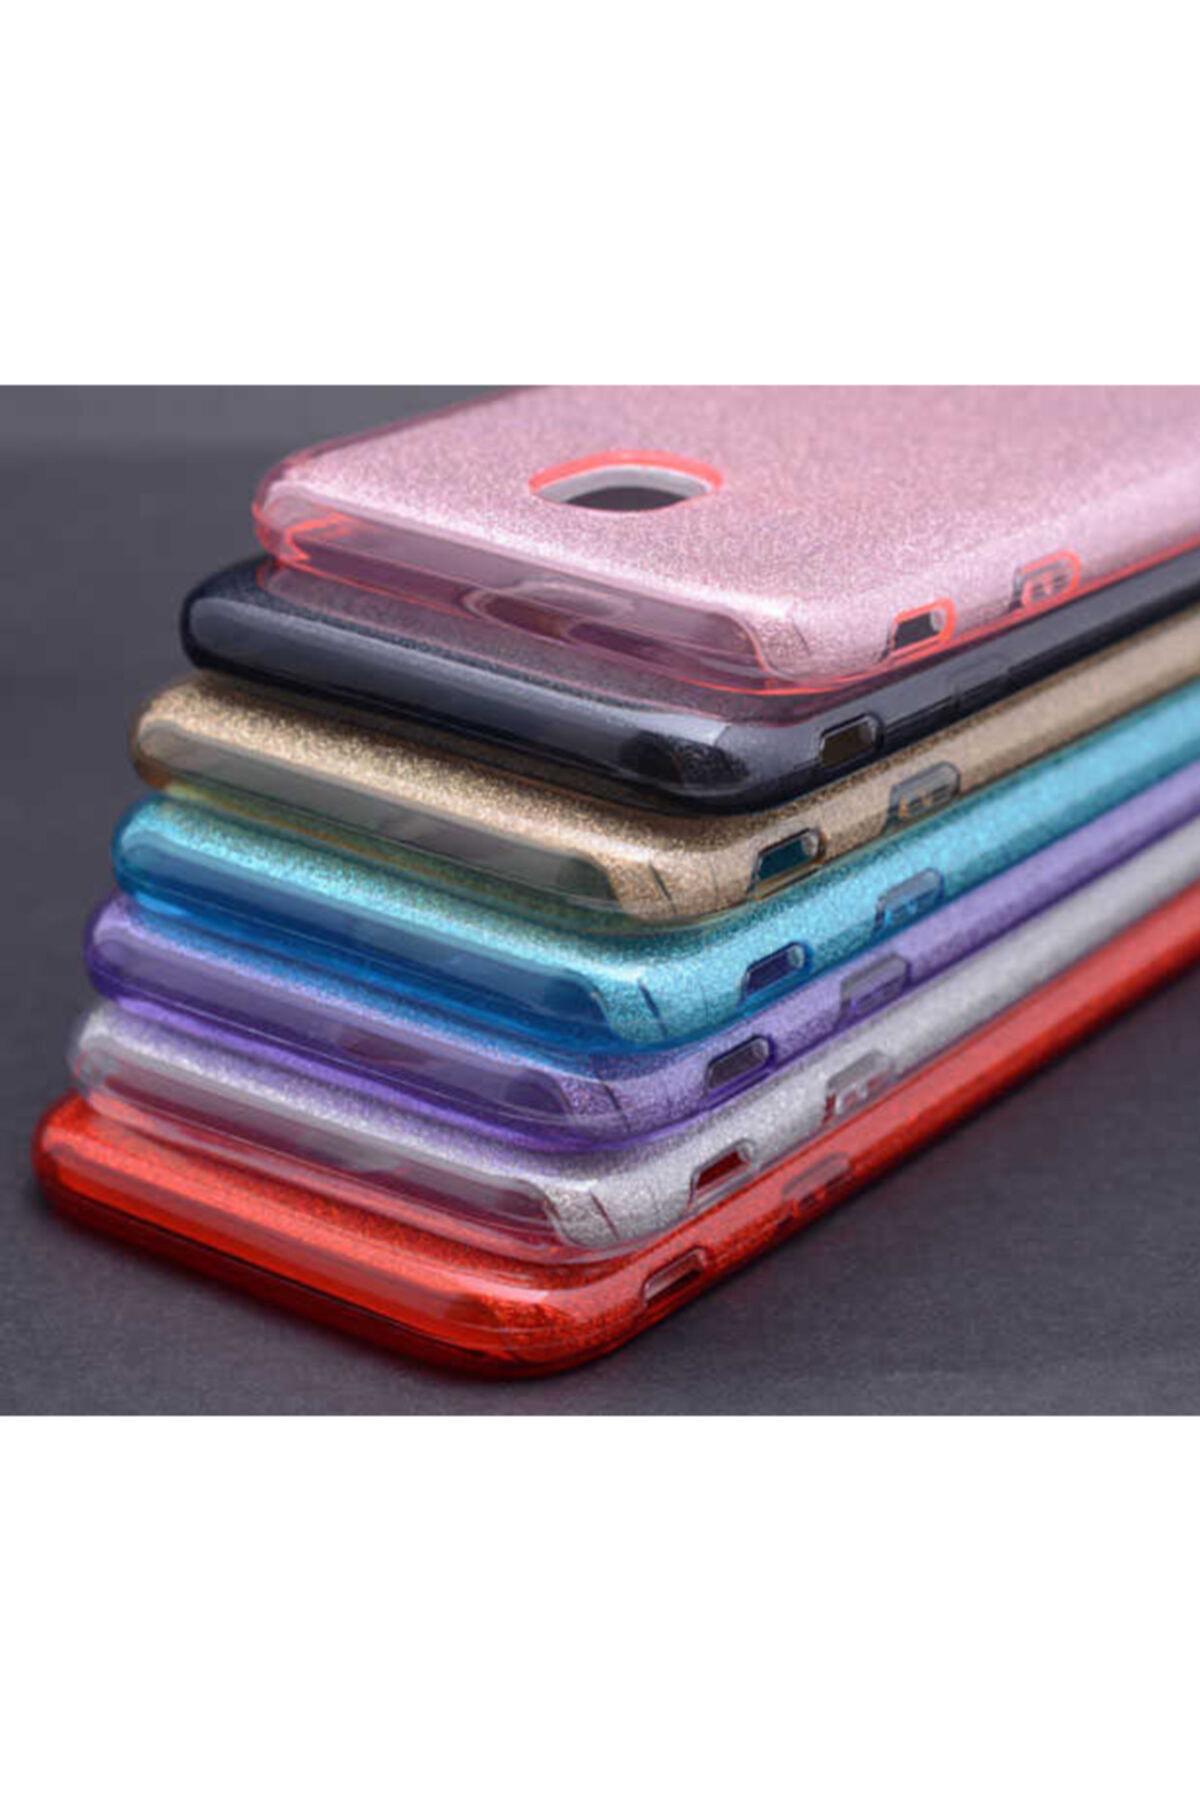 Samsung Galaxy J7 Pro (j730) Uyumlu Kılıf Shiny Glitter, Simli Zarif Mükemmel Tasarım